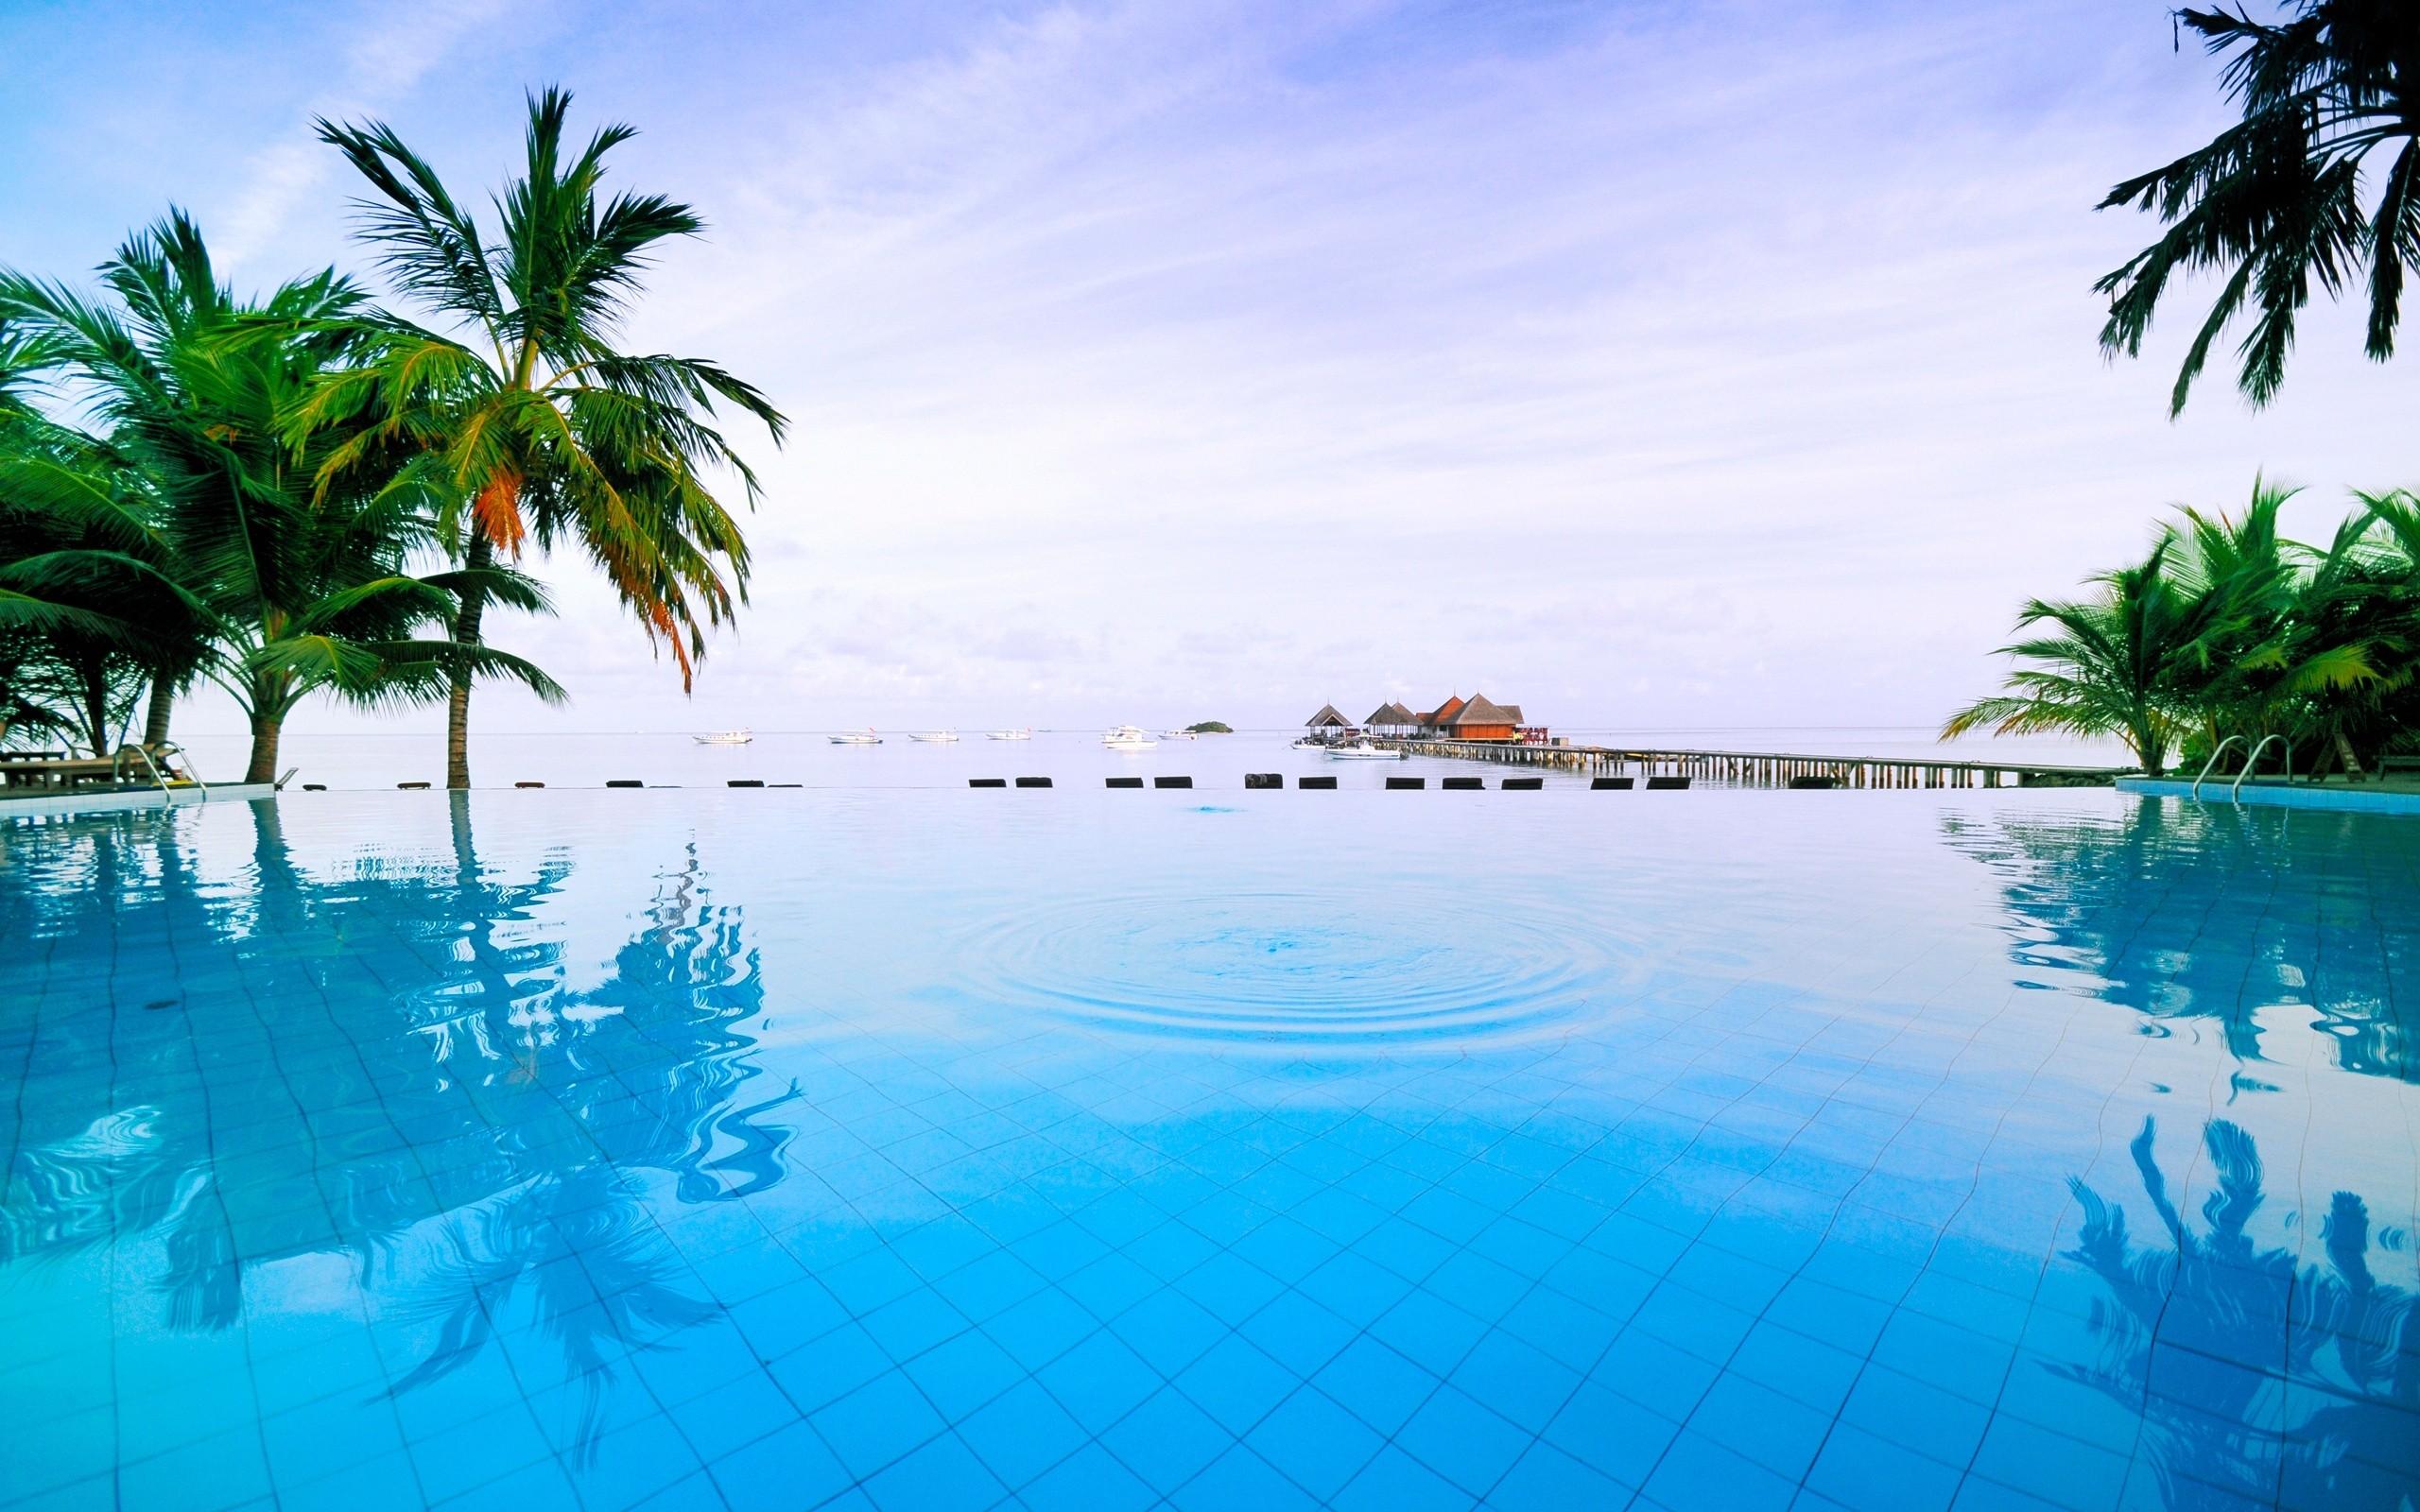 Bouhayrat Swimming Pool Construction And Maintenance Company Ltd Linkedin